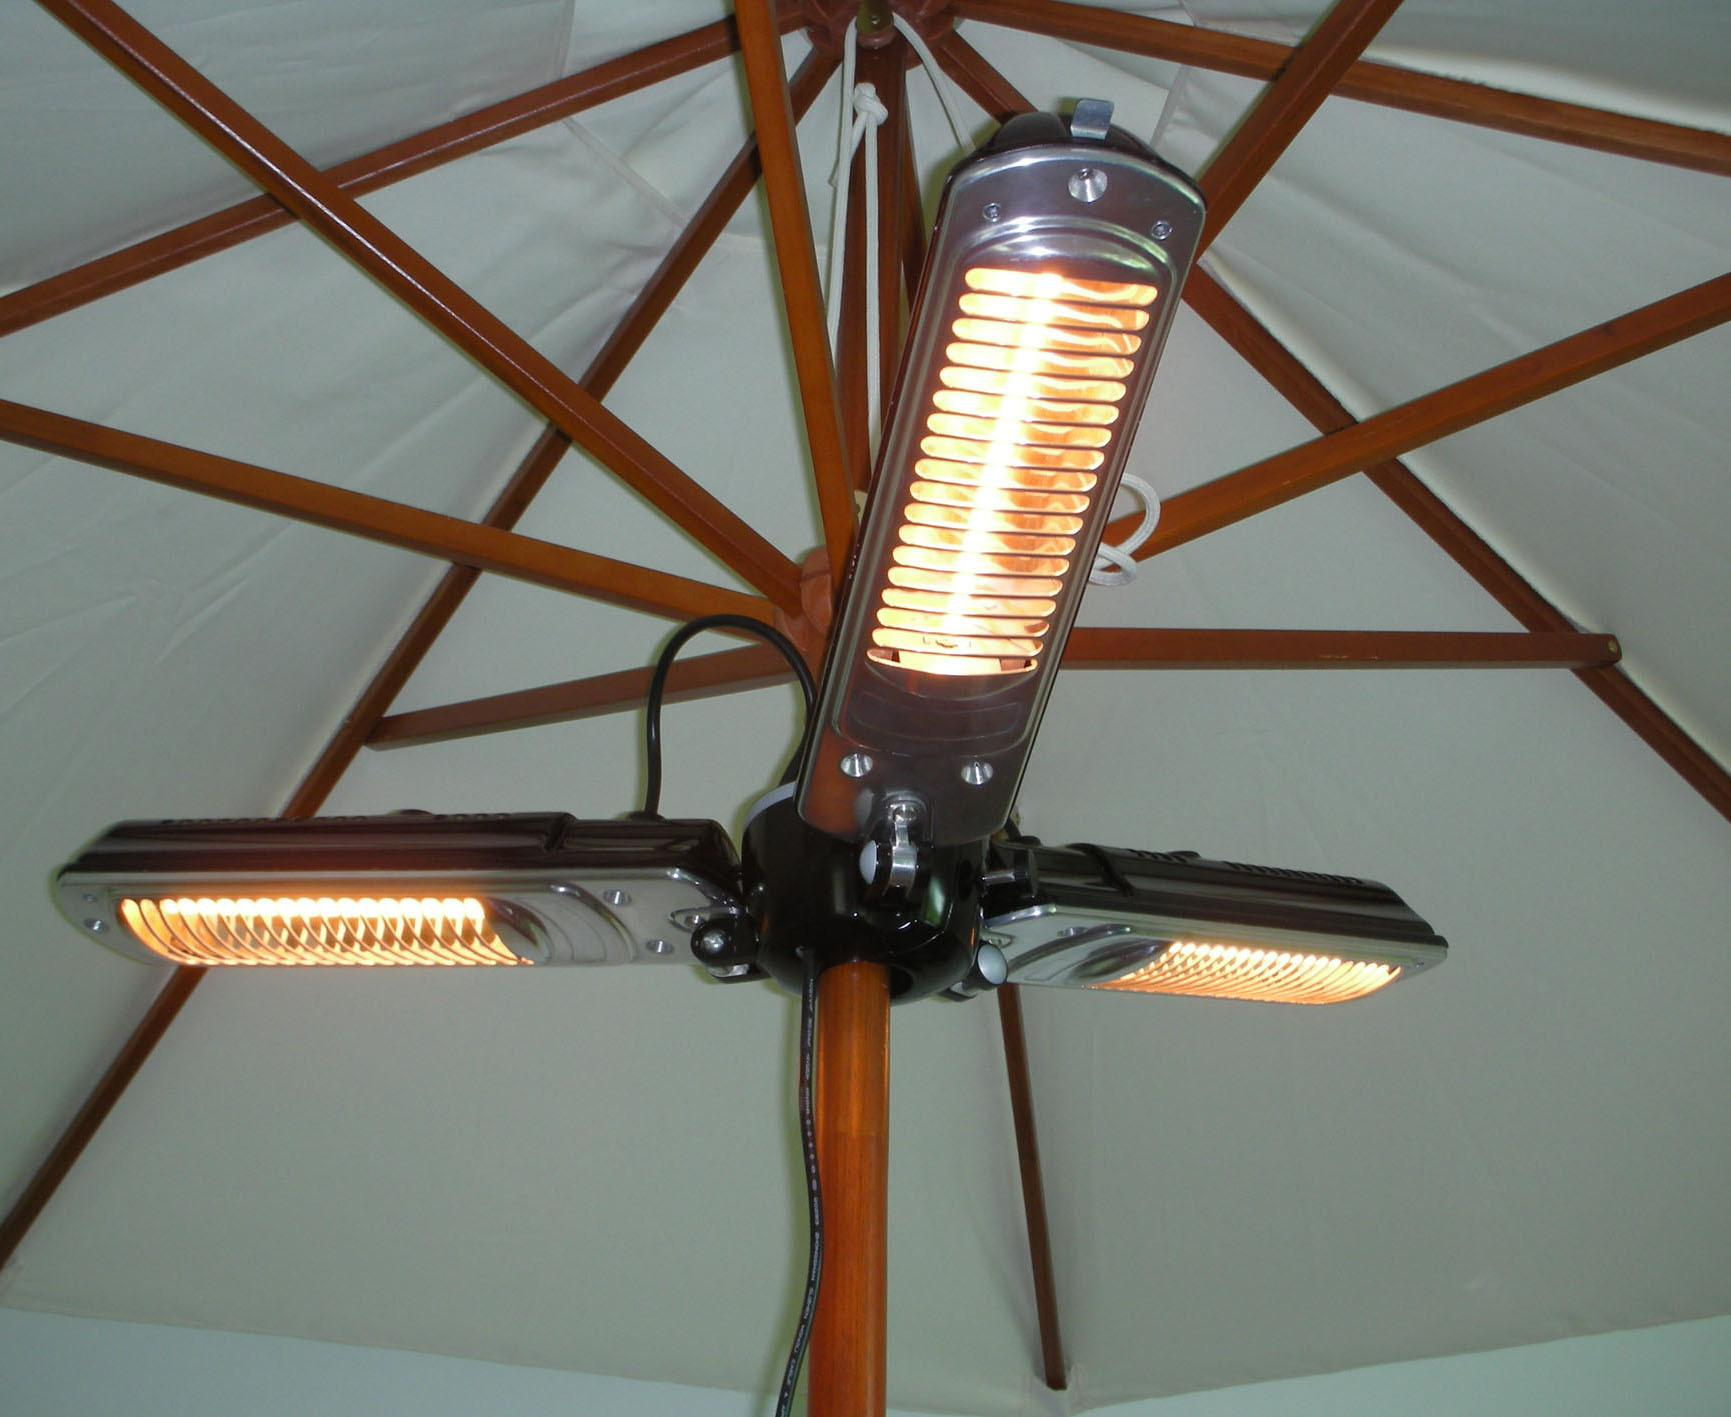 parasol patio heater patio heater review. Black Bedroom Furniture Sets. Home Design Ideas